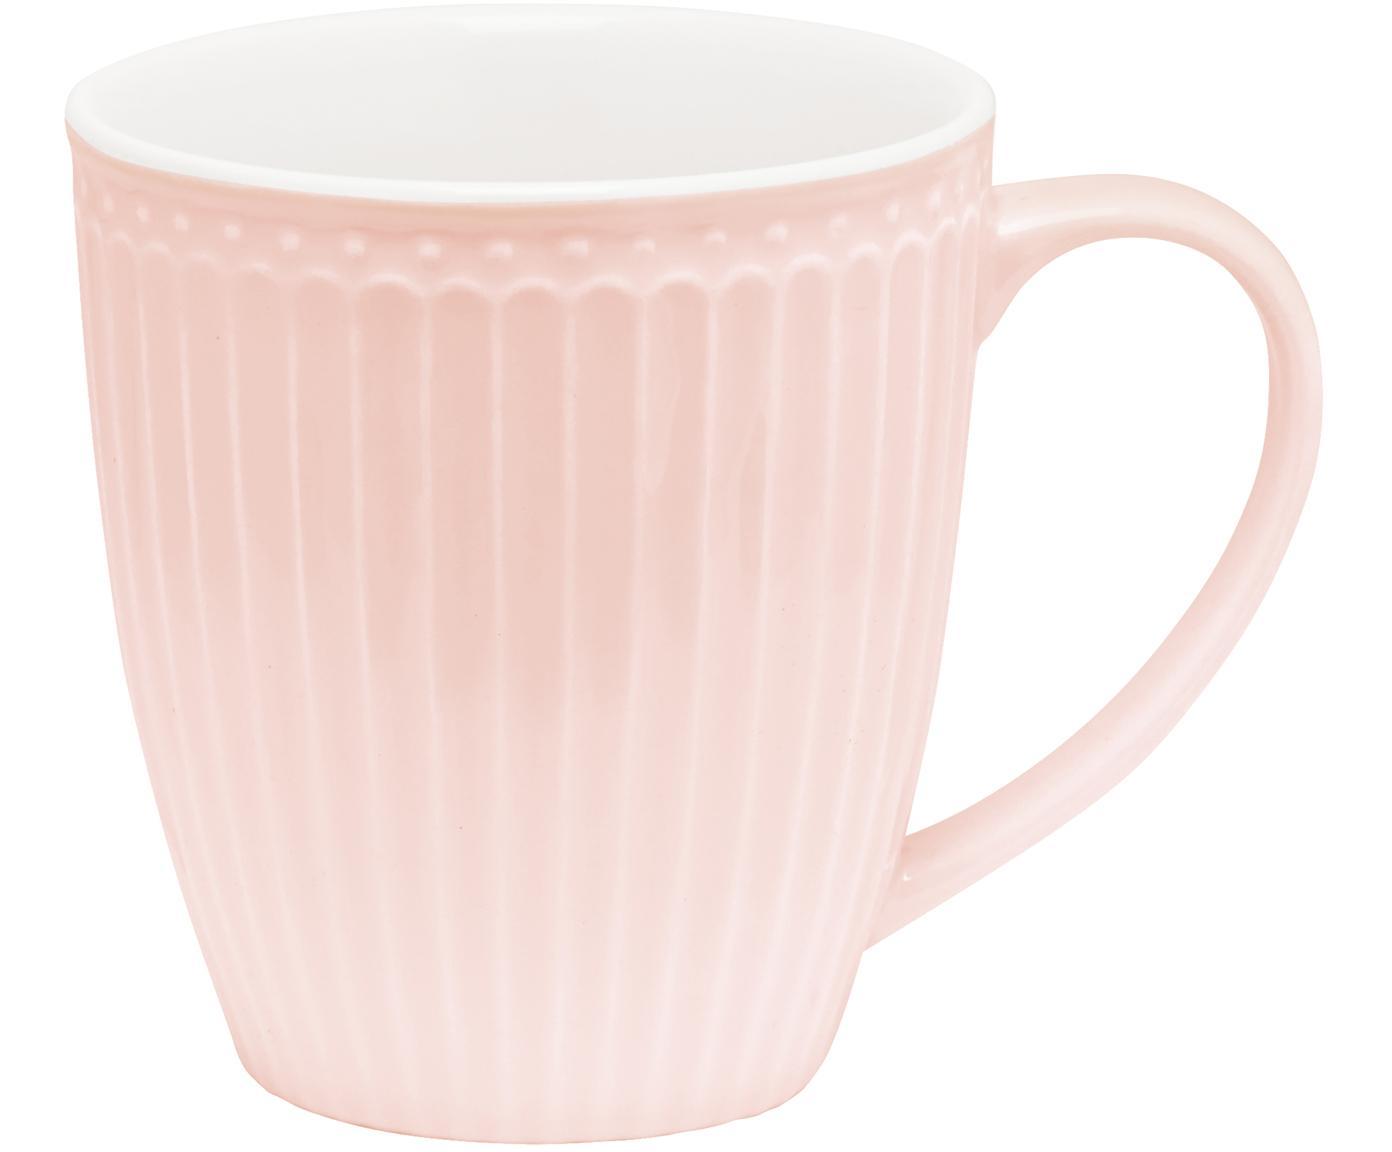 Mokken Alice, 2 stuks, Porselein, Roze, Ø 10 x H 10 cm